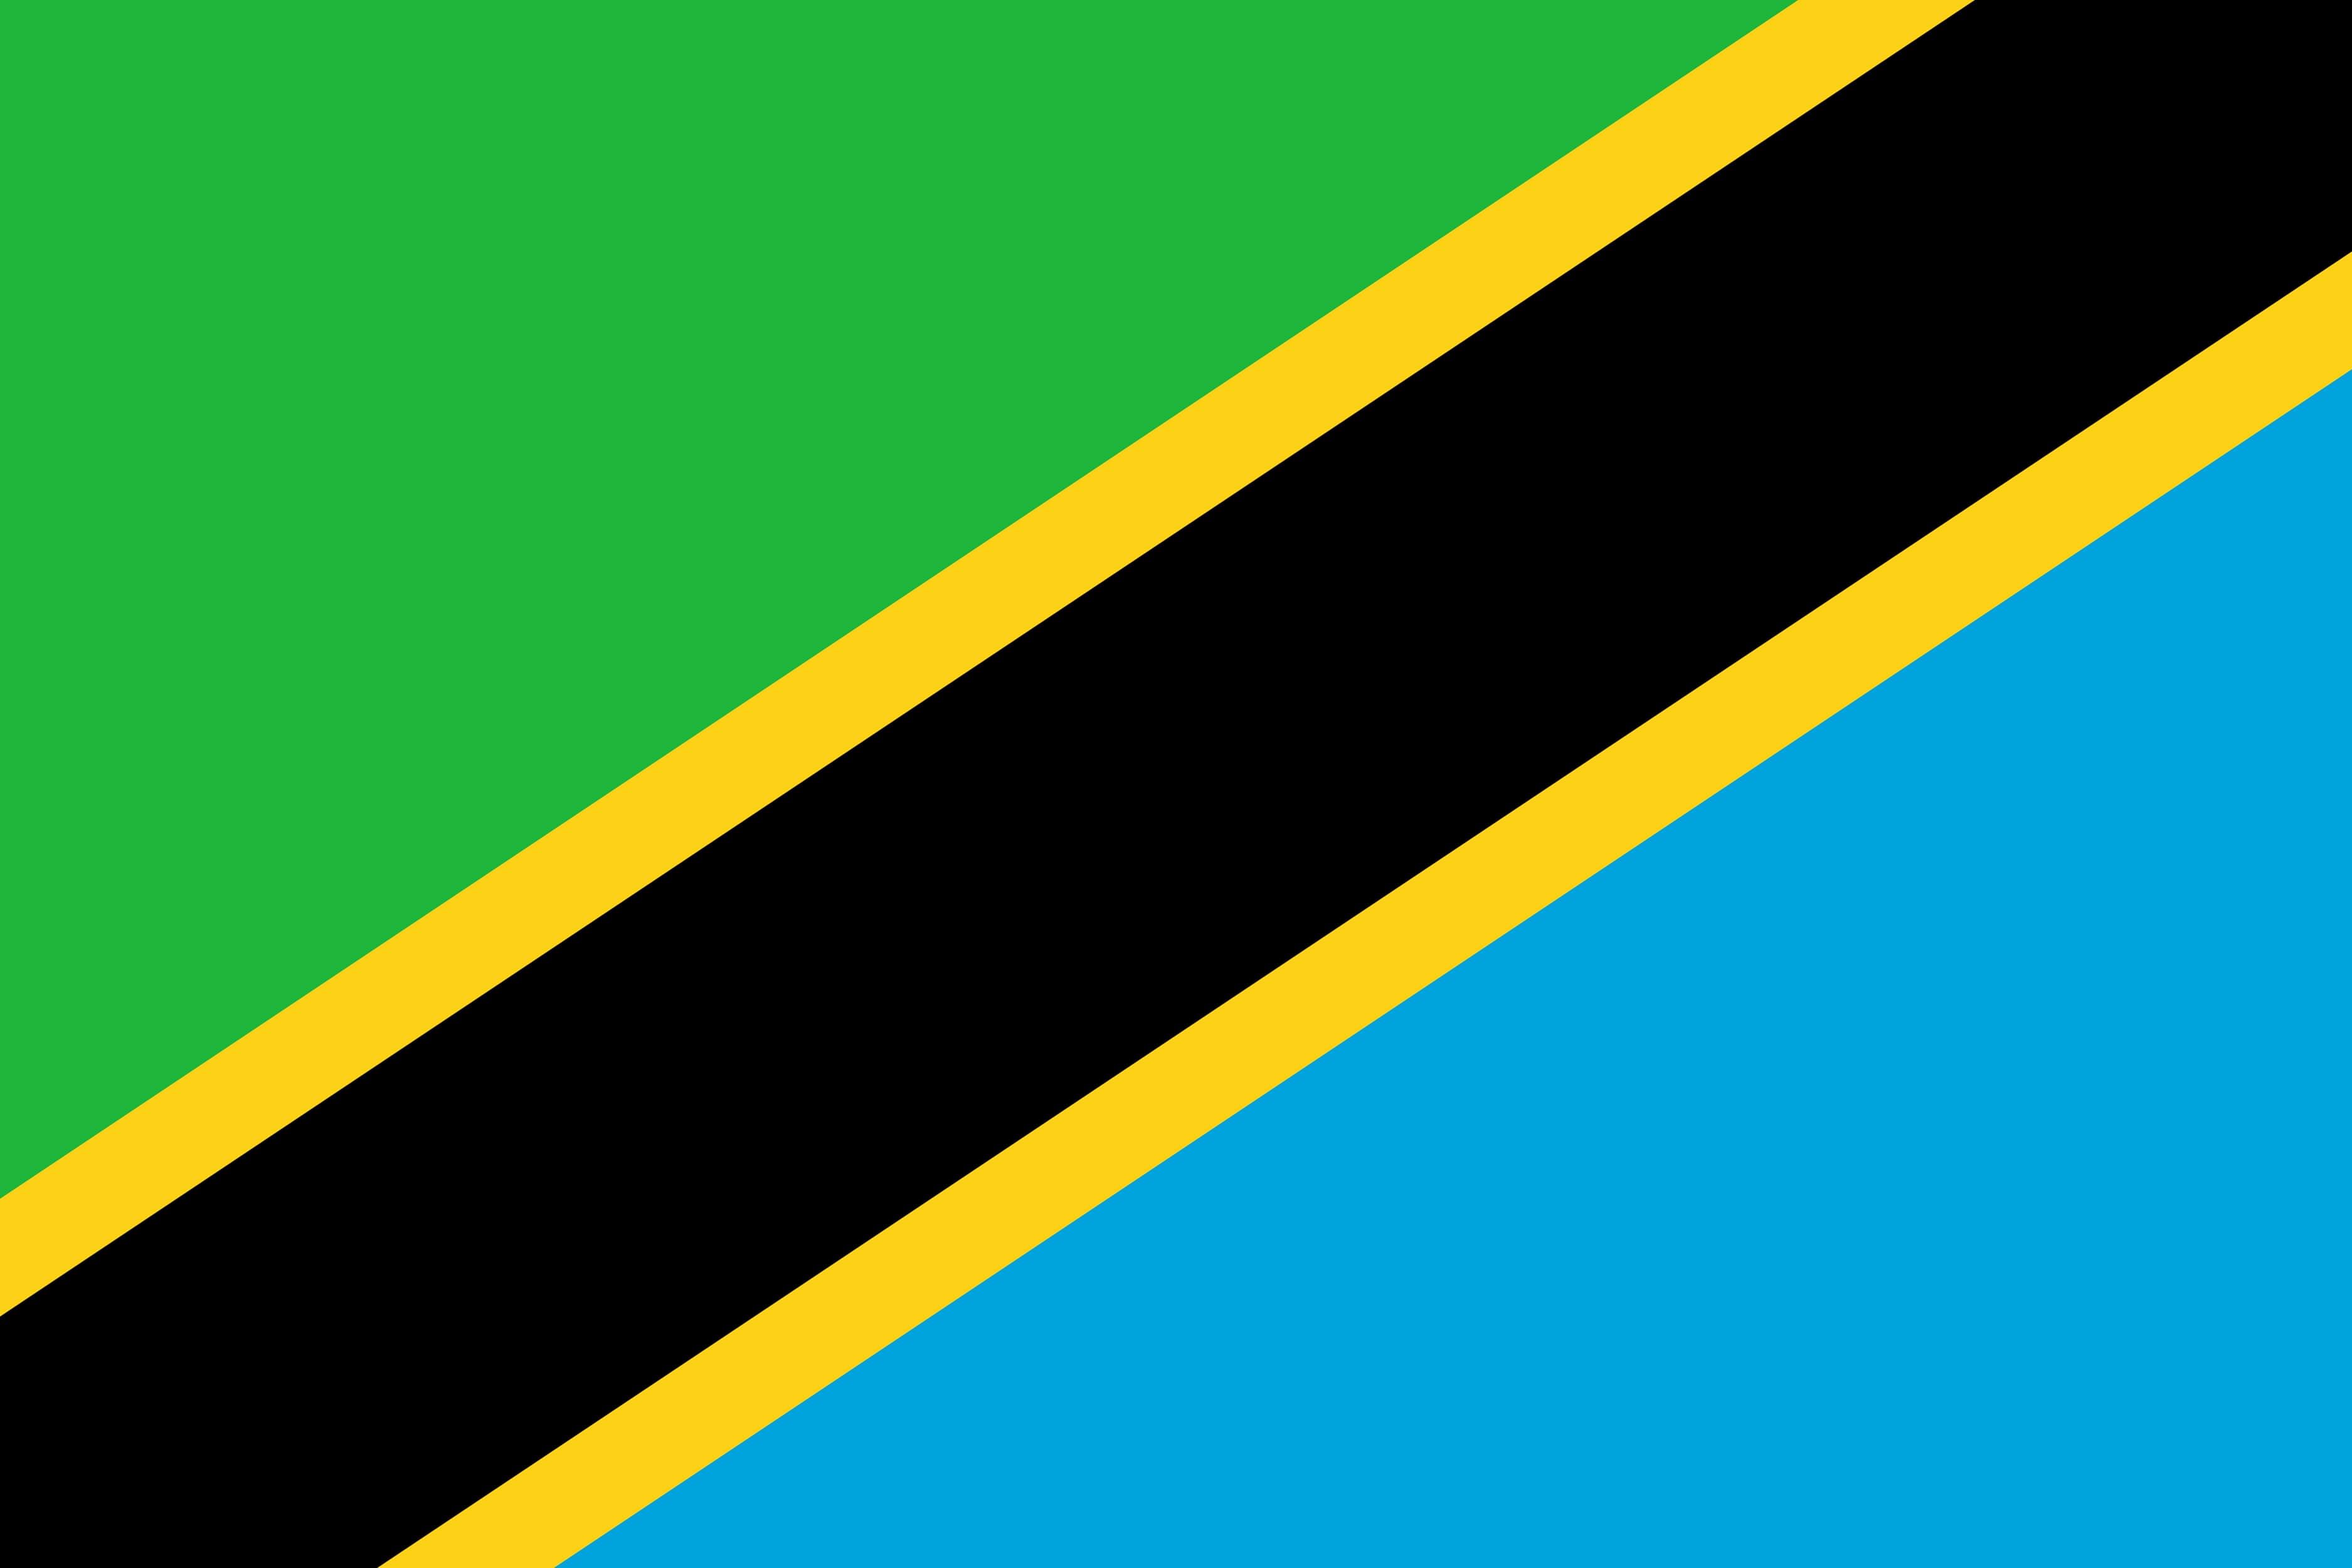 Sådan ser Tanzanias flag ud